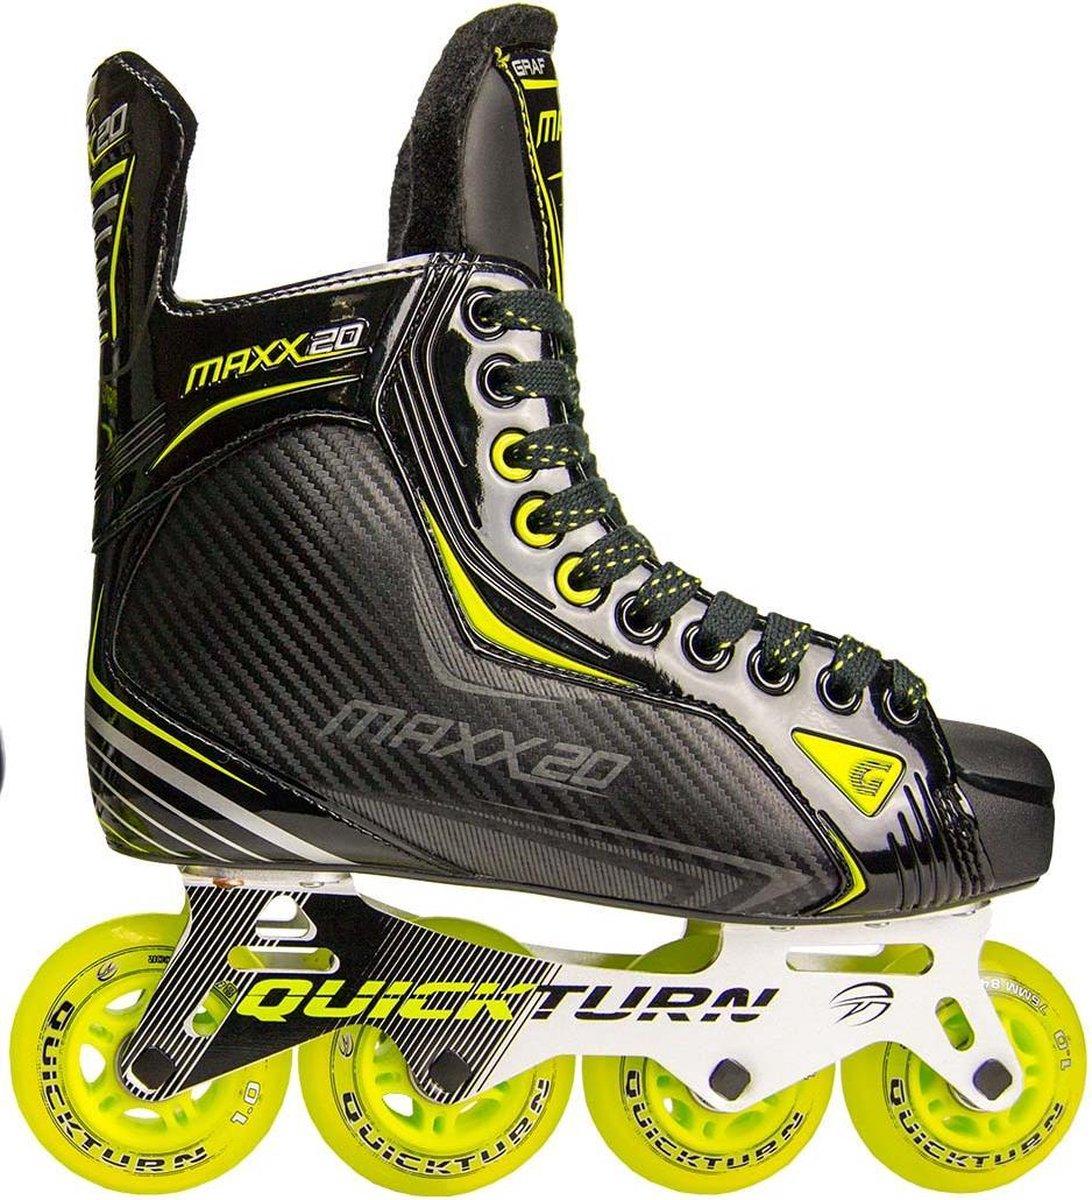 Streethockey inlineskate Graf Maxx 20 inliner maat 40